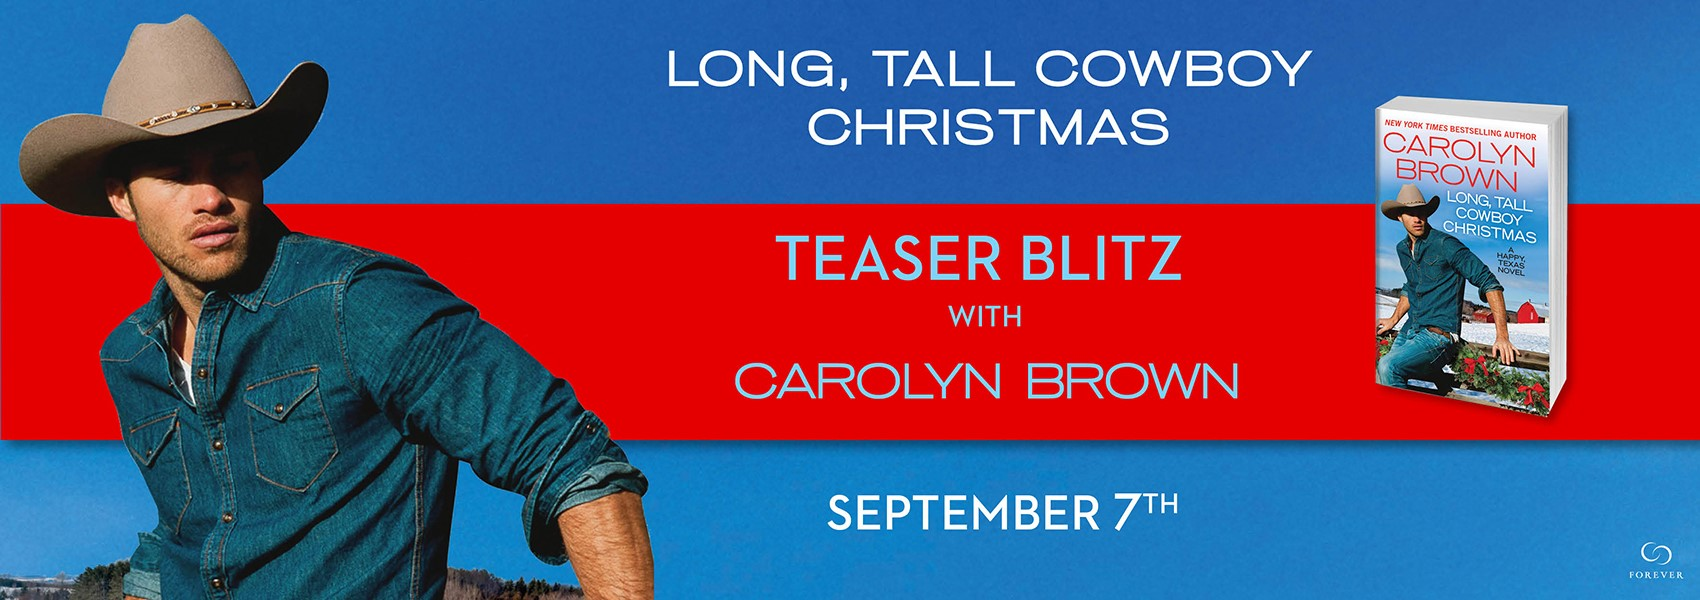 Long, Tall Cowboy Christmas by Caroline Brown